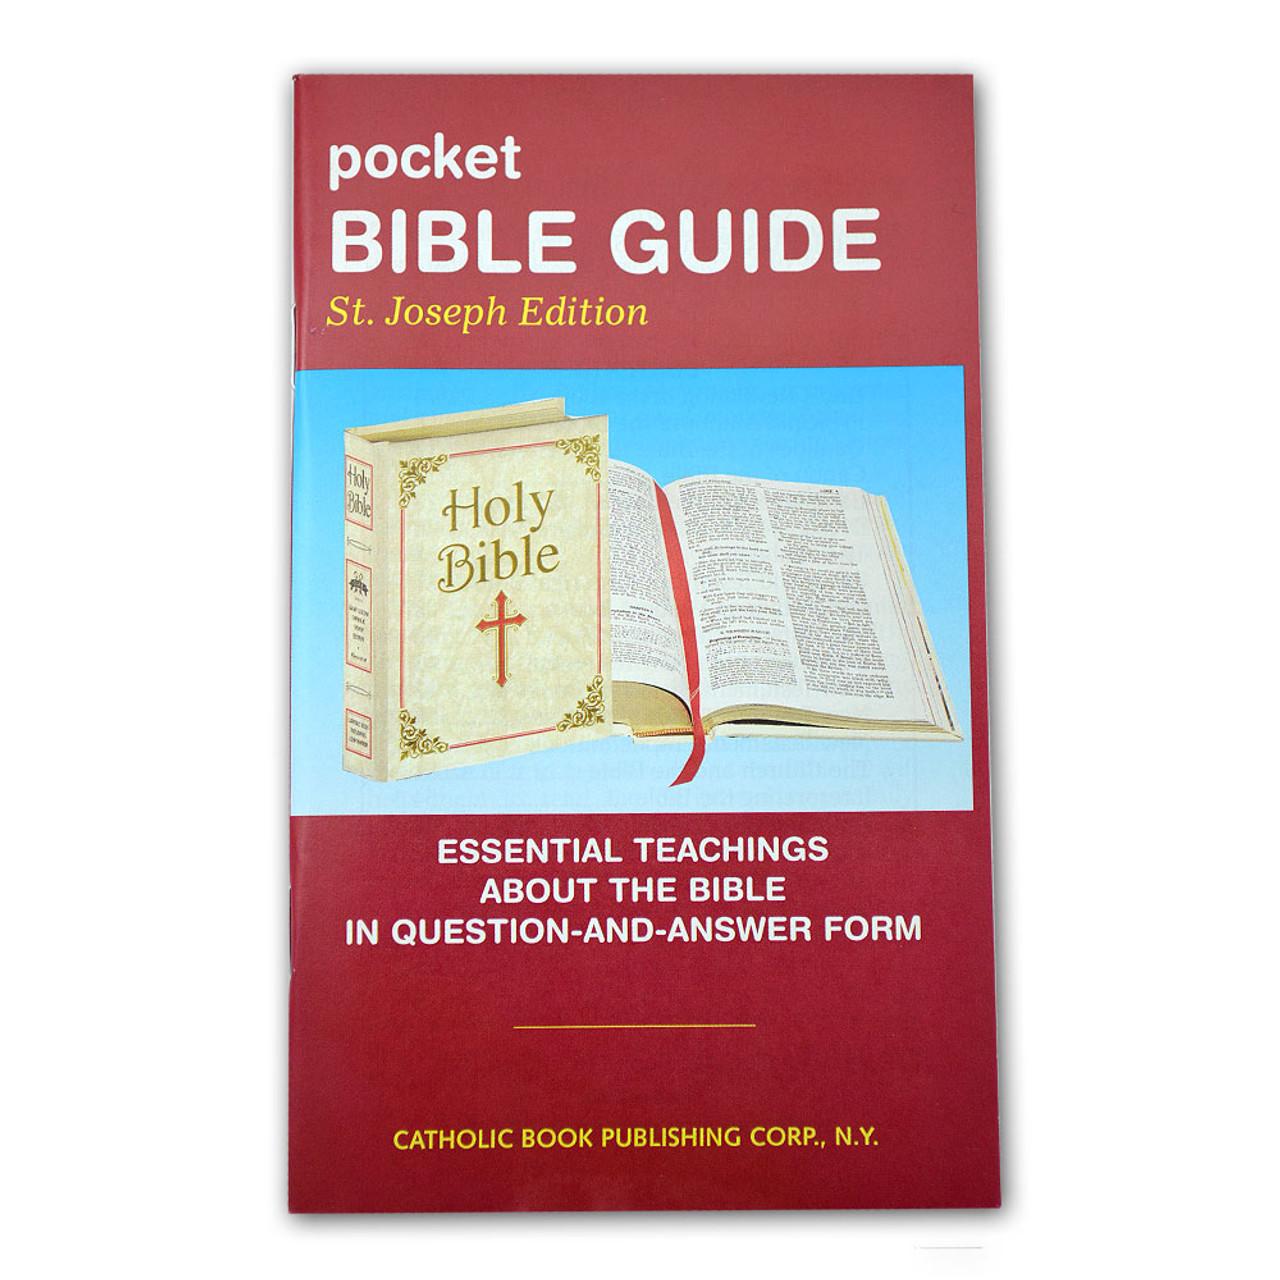 Pocket Bible Guide St. Joseph Edition